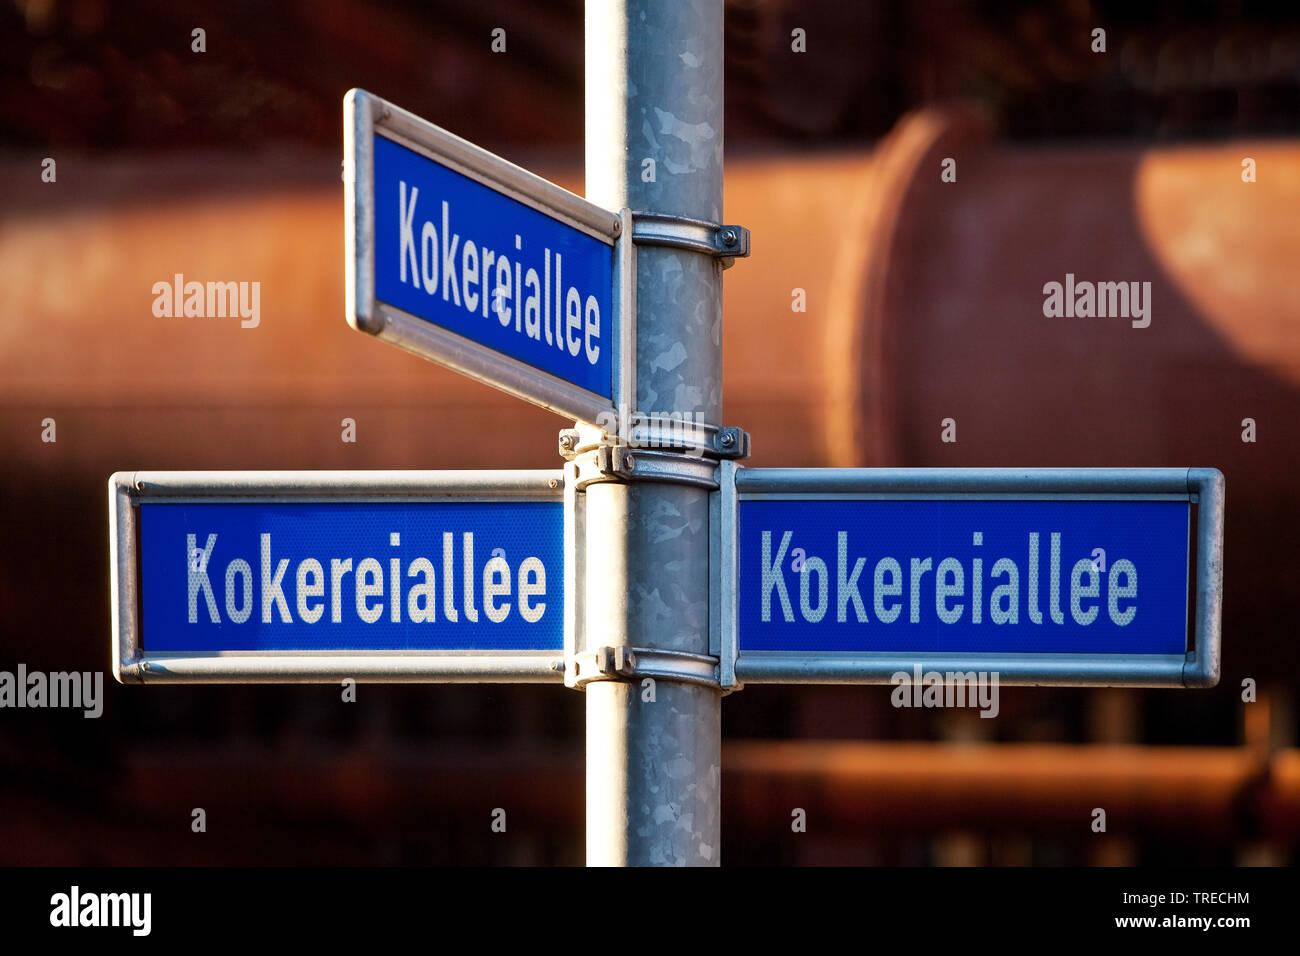 Strassenschilder Kokereiallee, Kokerei Zollverein, Deutschland, Nordrhein-Westfalen, Ruhrgebiet, Essen | street name signs Kokereiallee, cooking plant - Stock Image